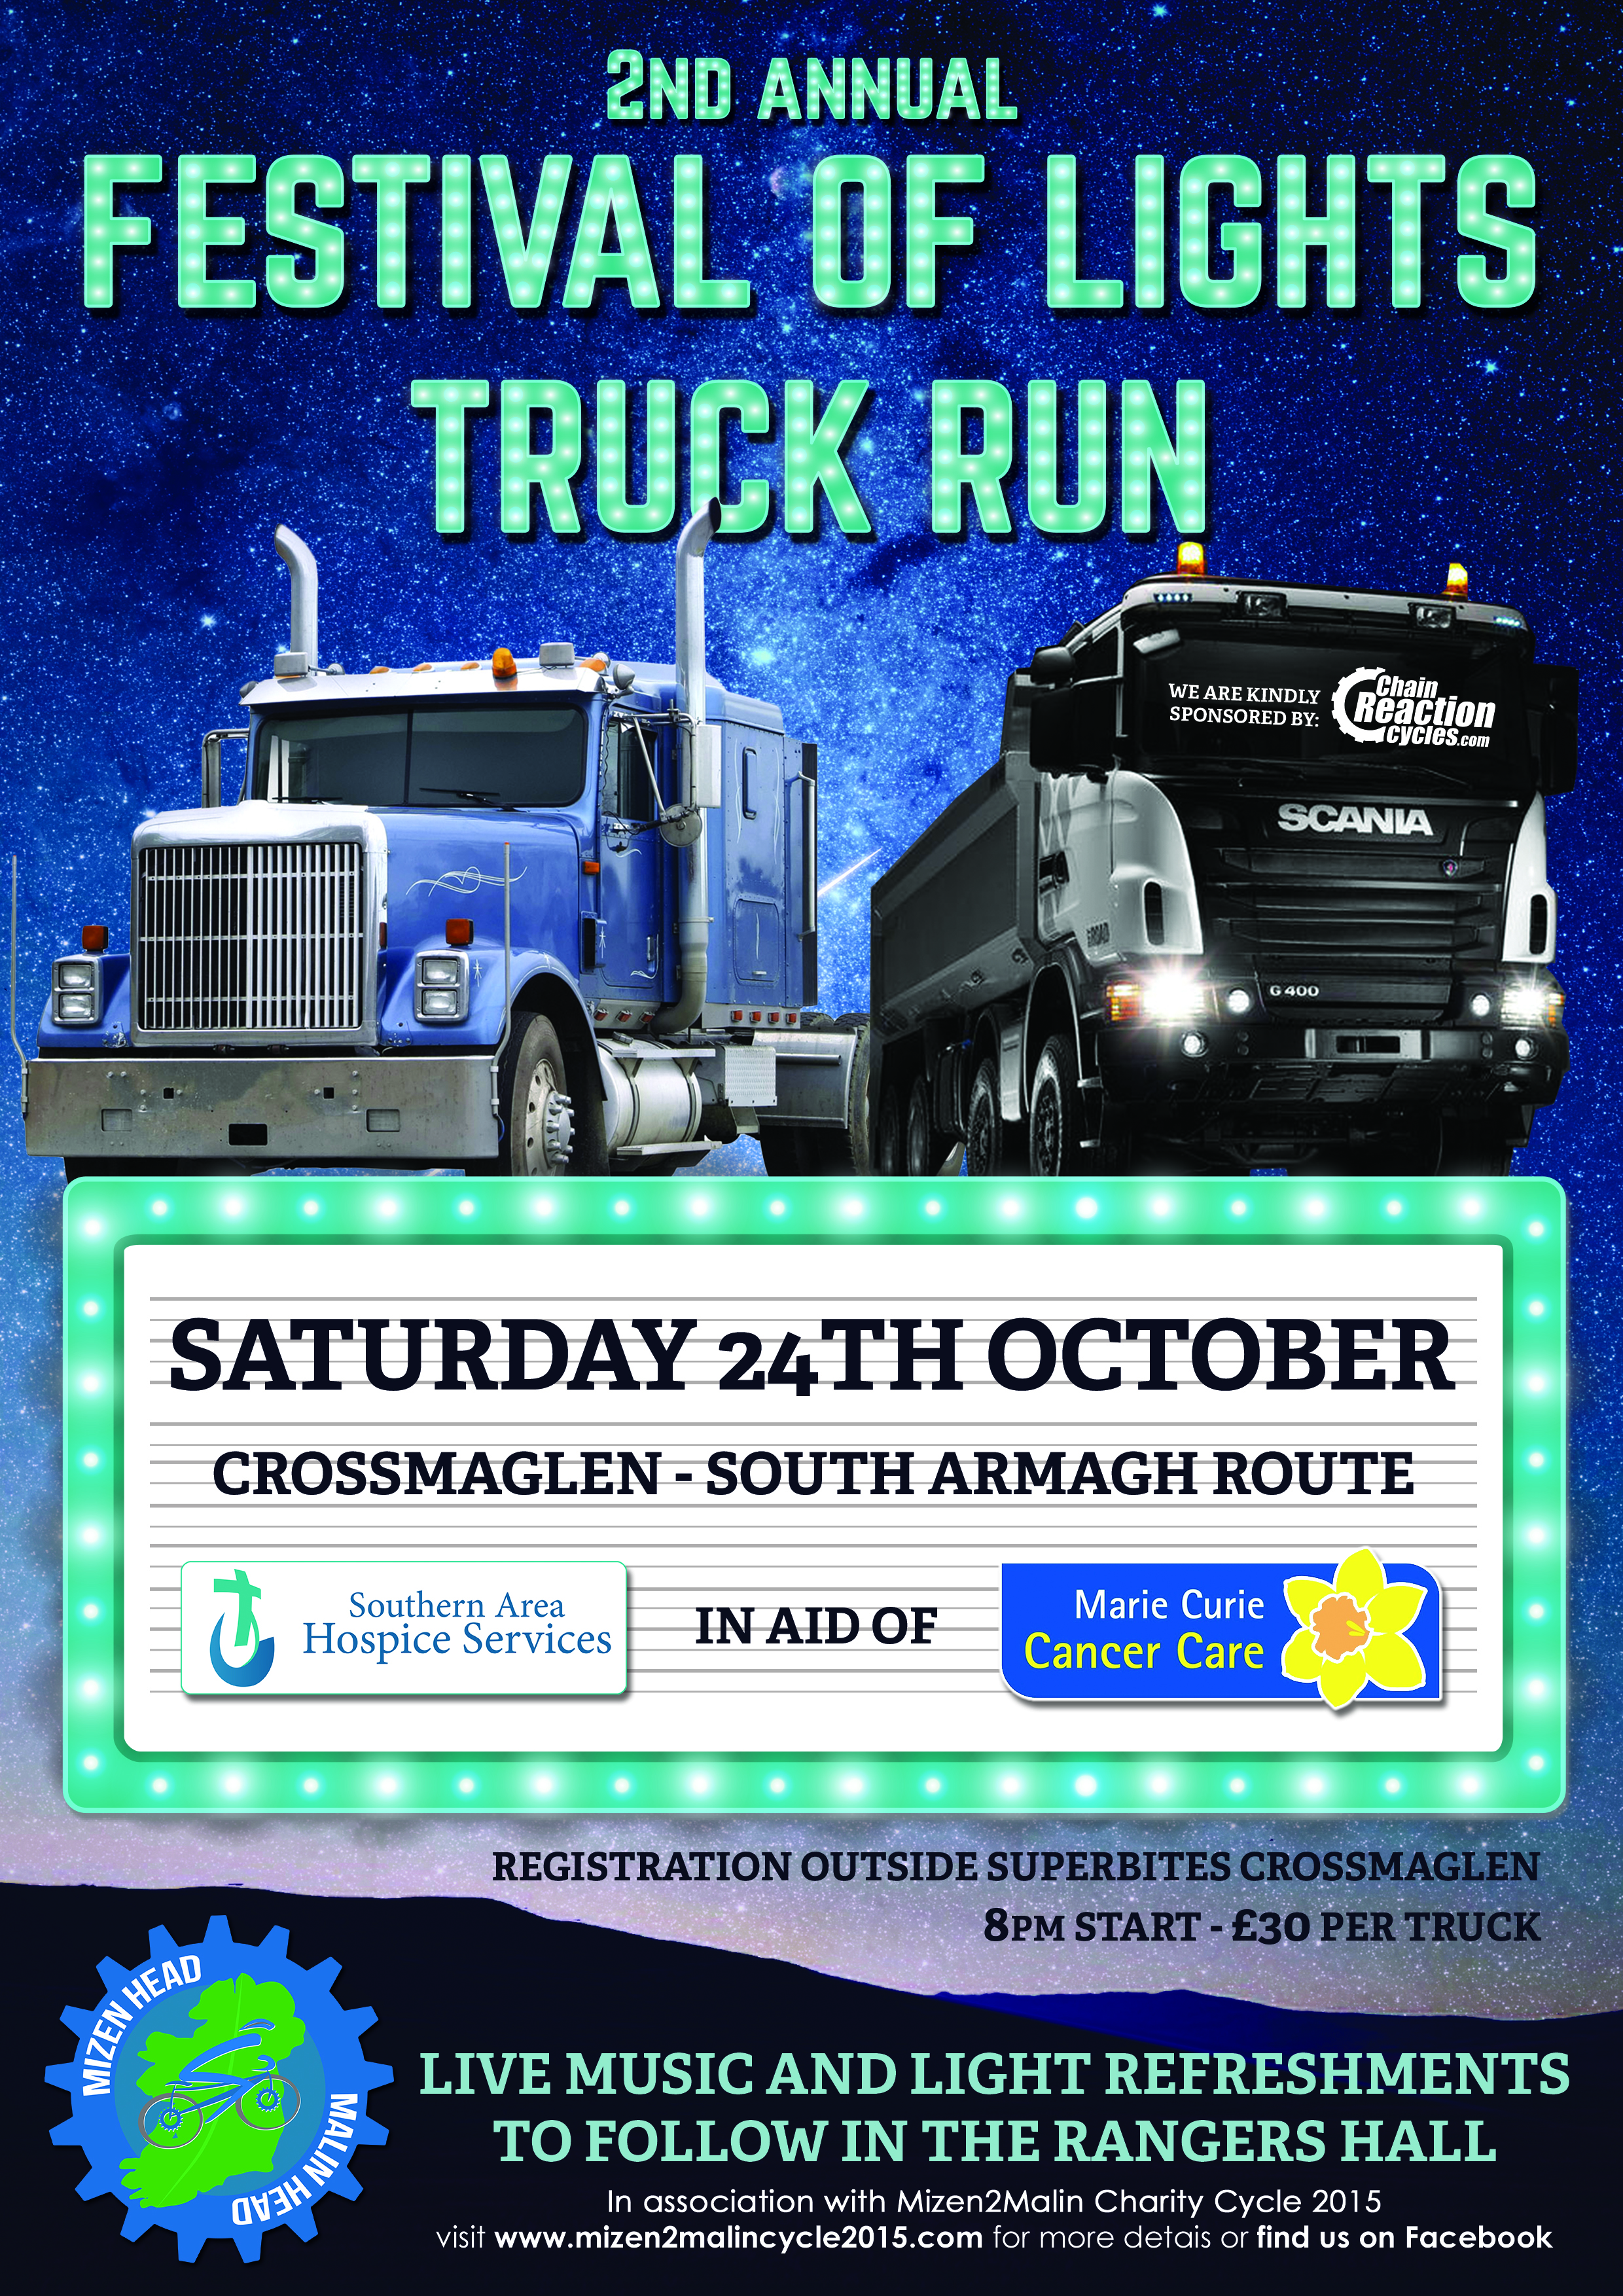 Festival of Lights Truck Run